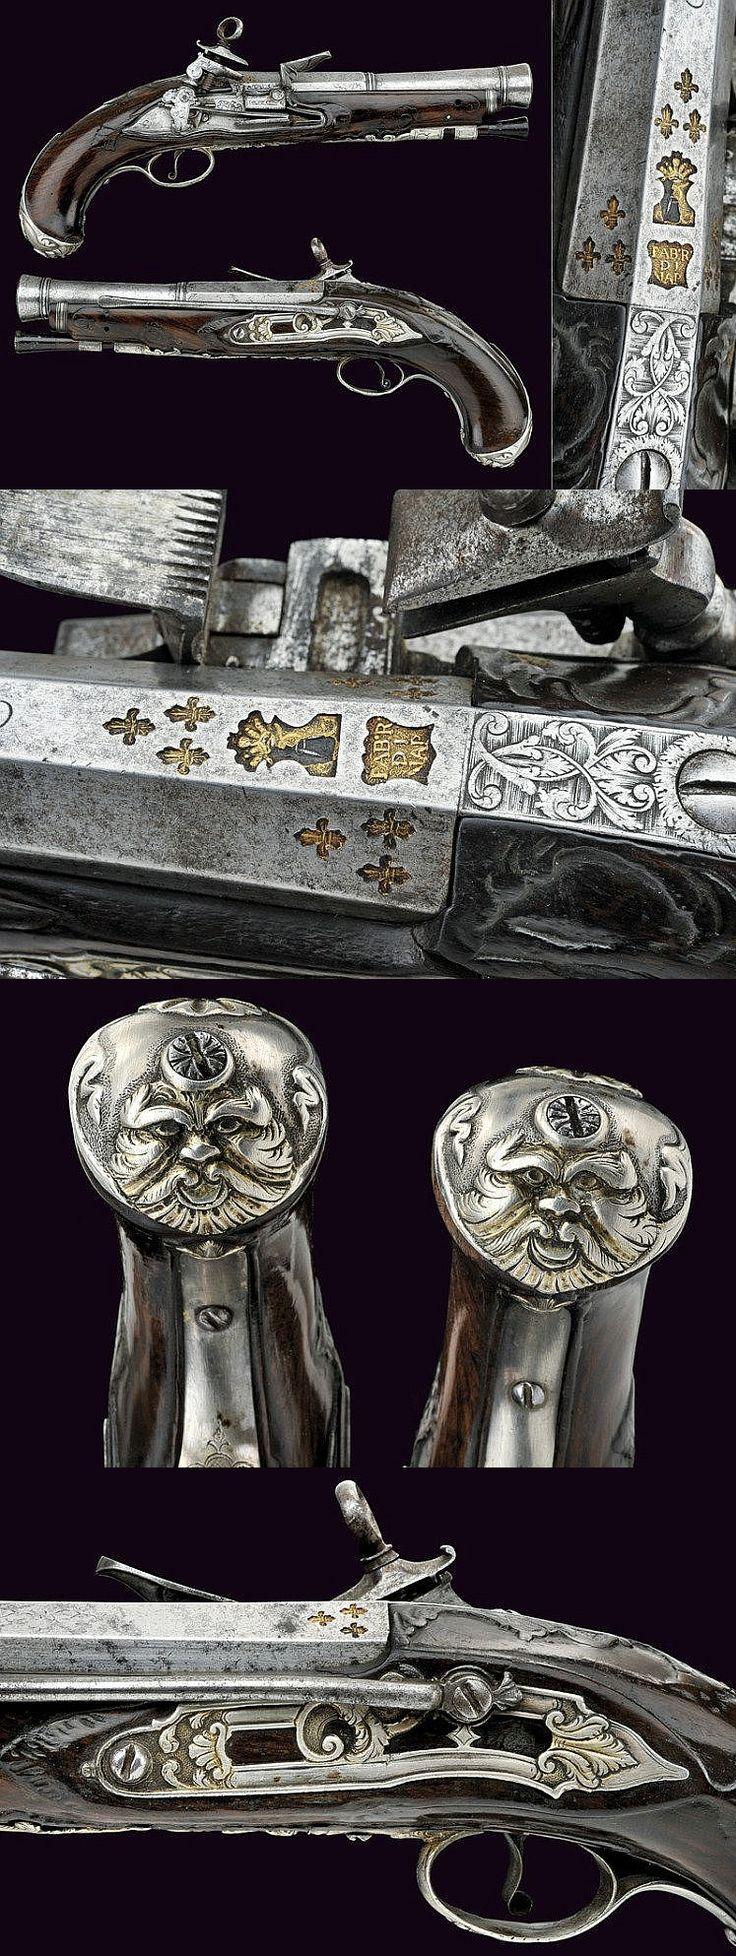 A pair of flintlock pistols by Vidalesio, Naples, ca. 18th century.